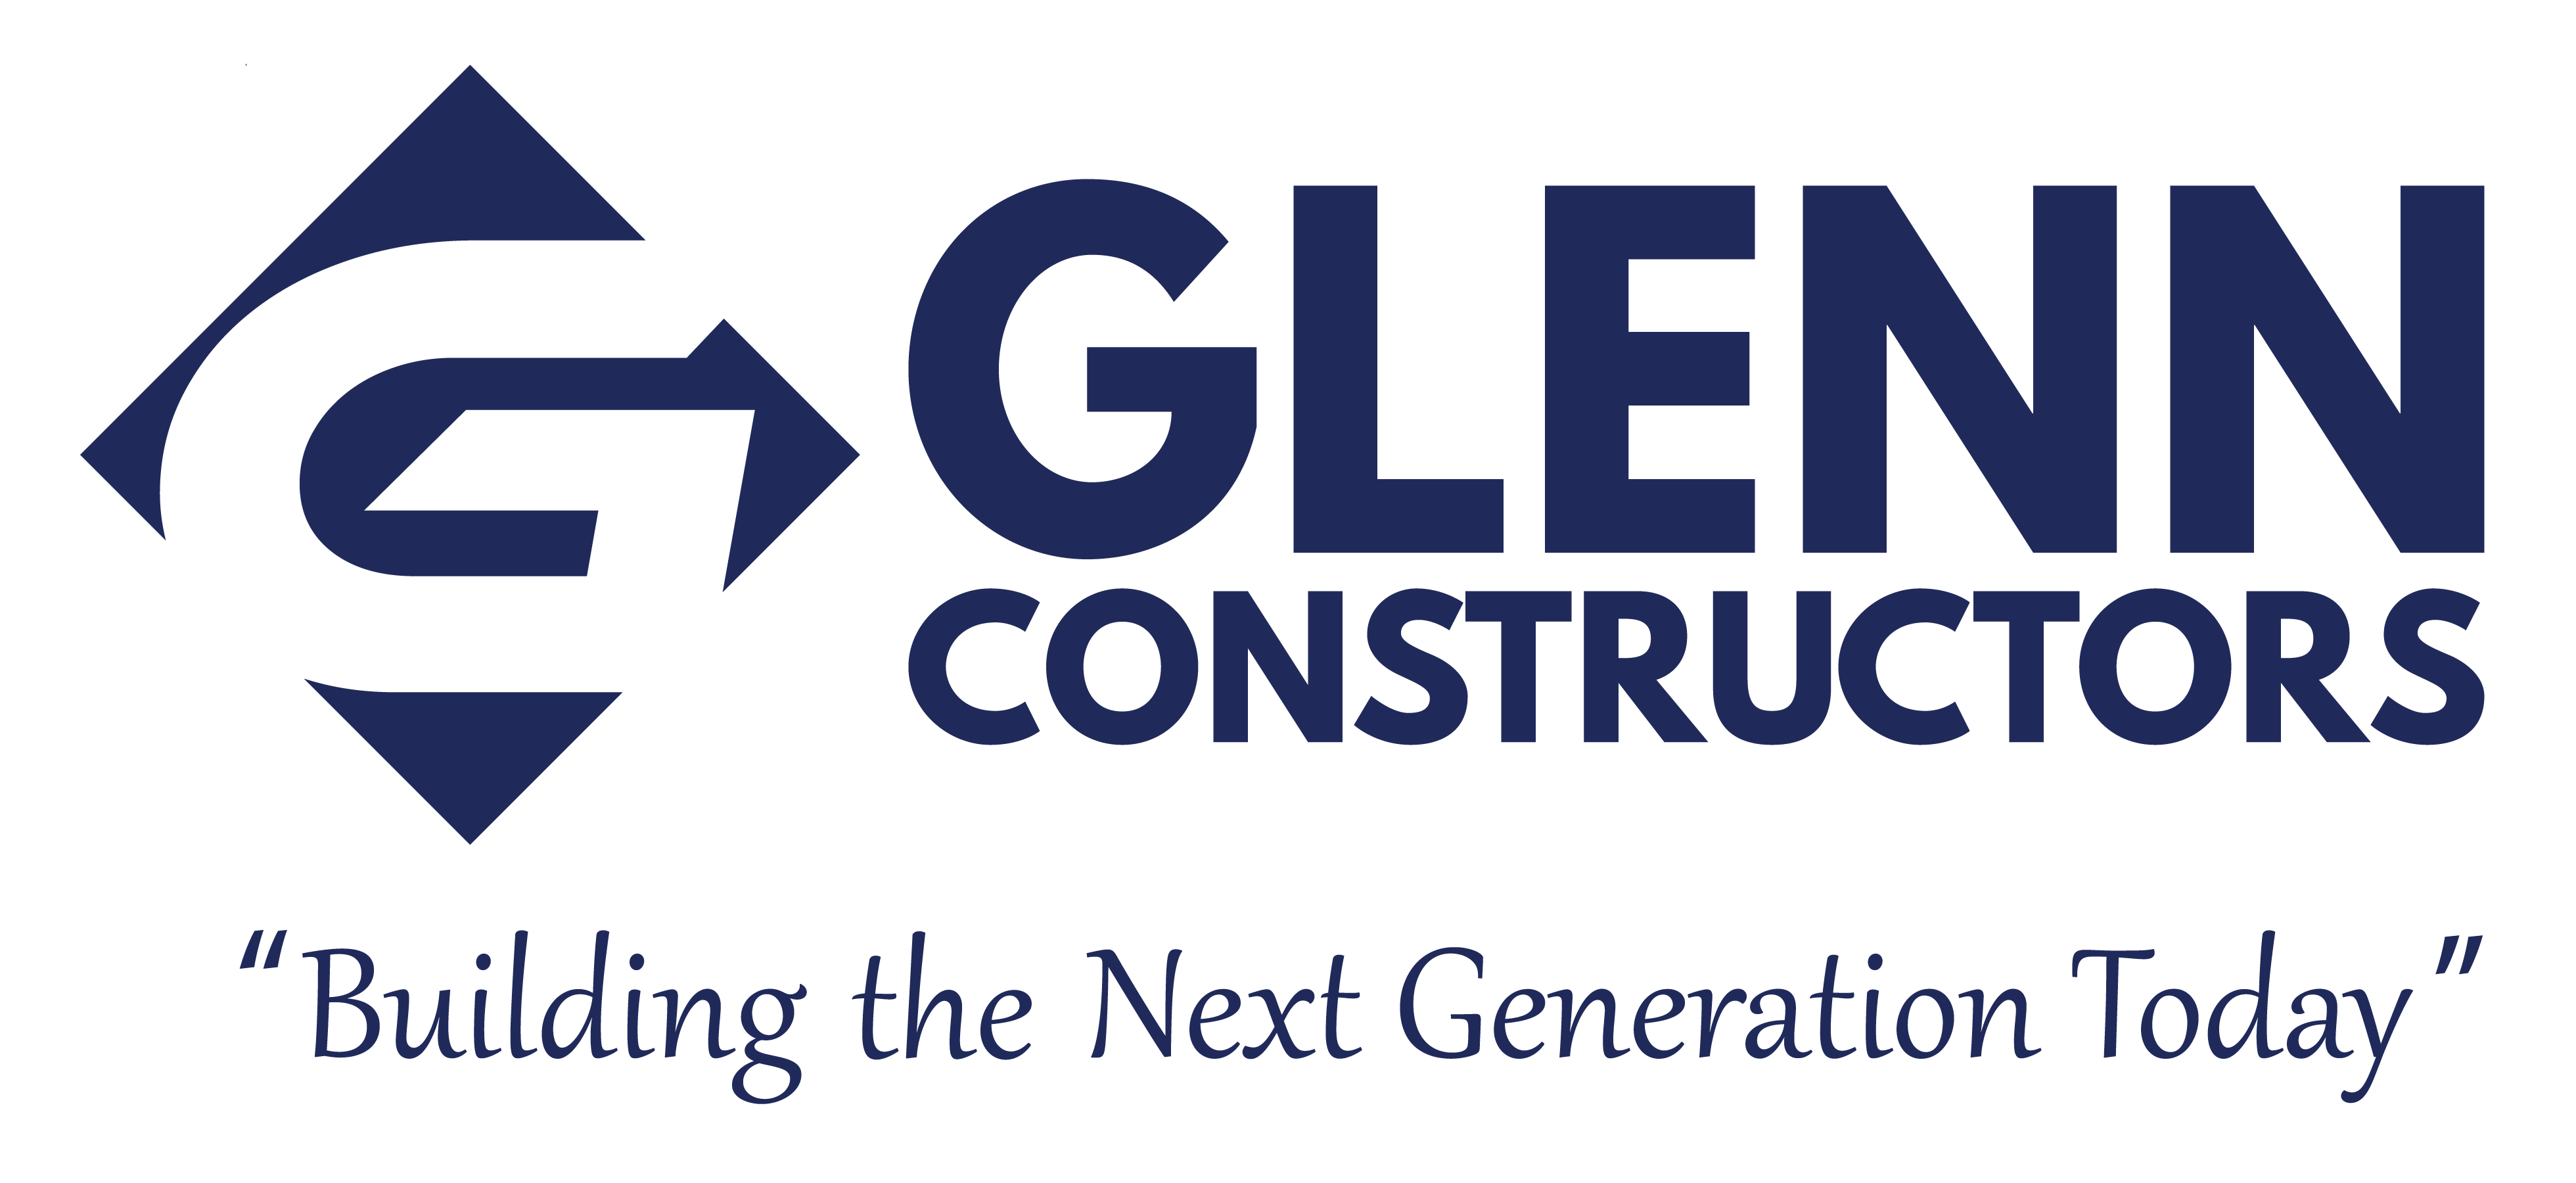 Glenn Constructors